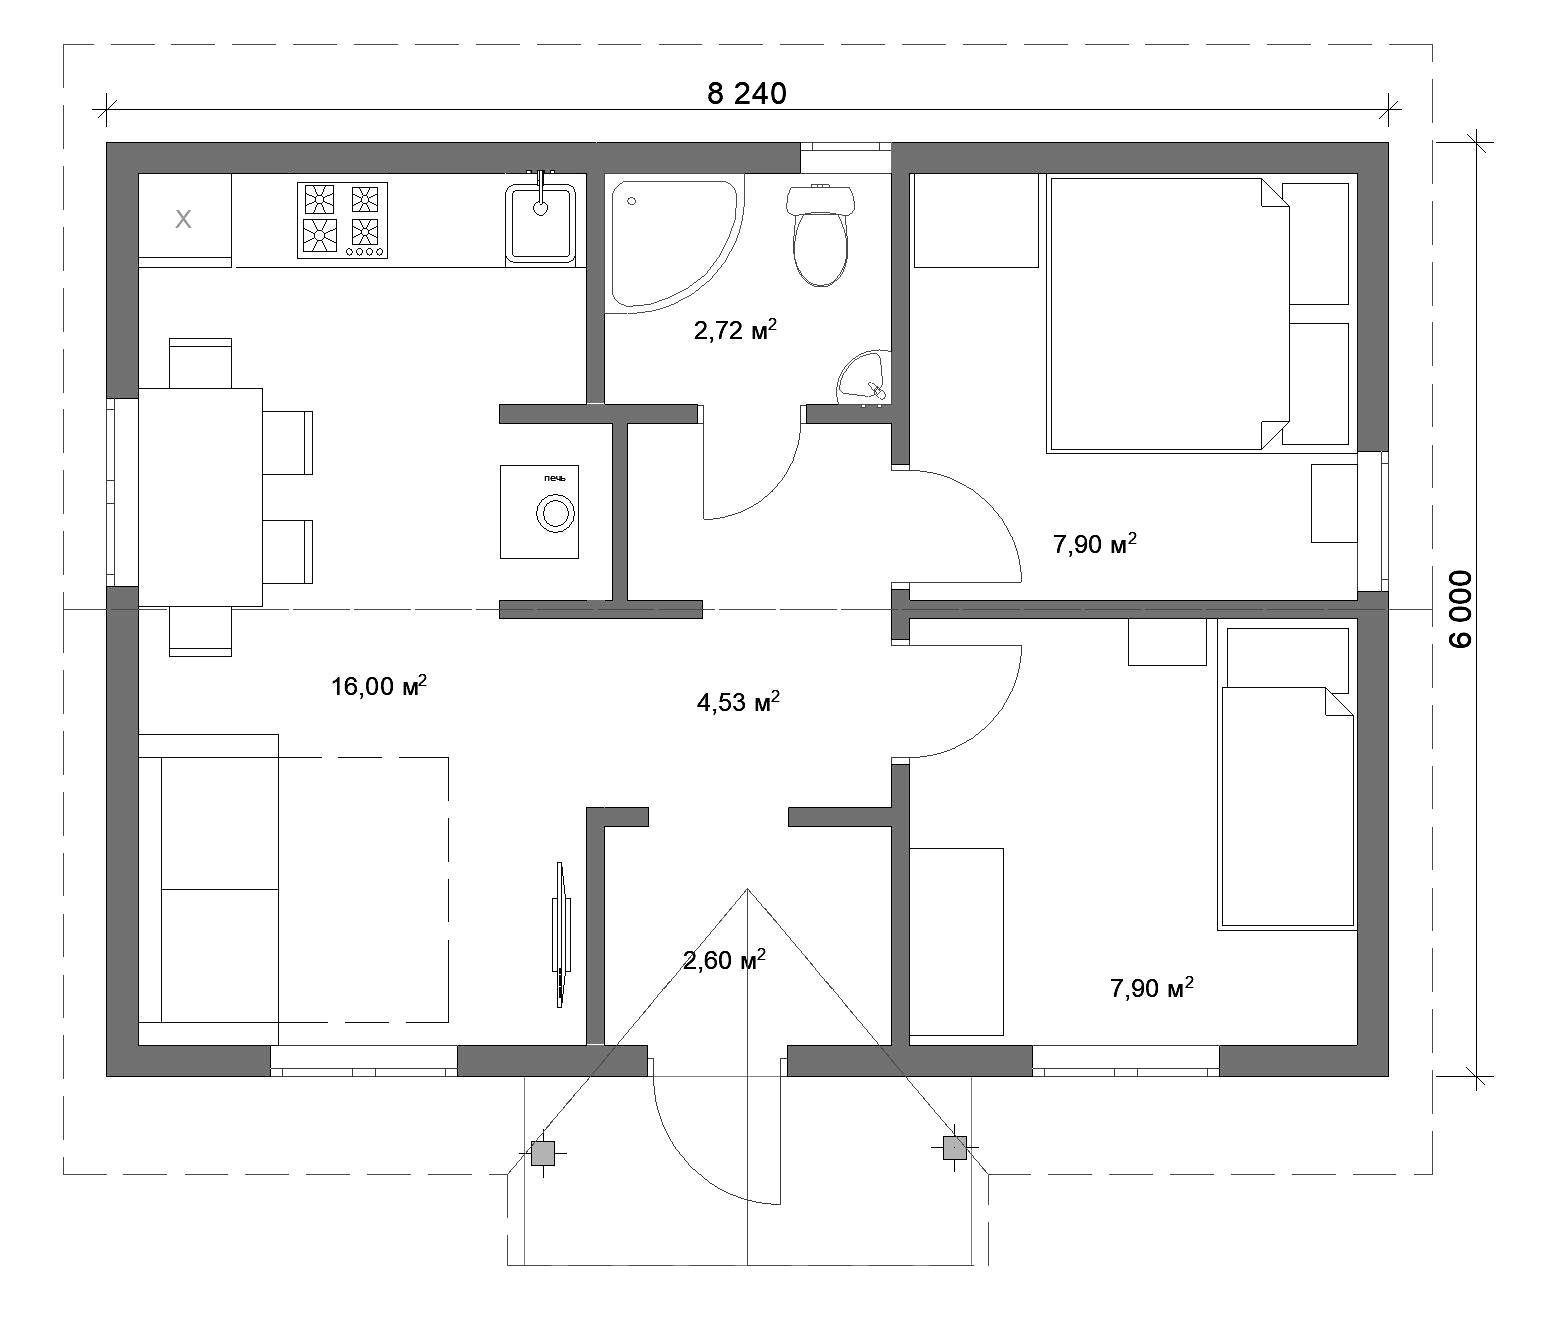 Проект одноэтажного загородного дома 6Х8